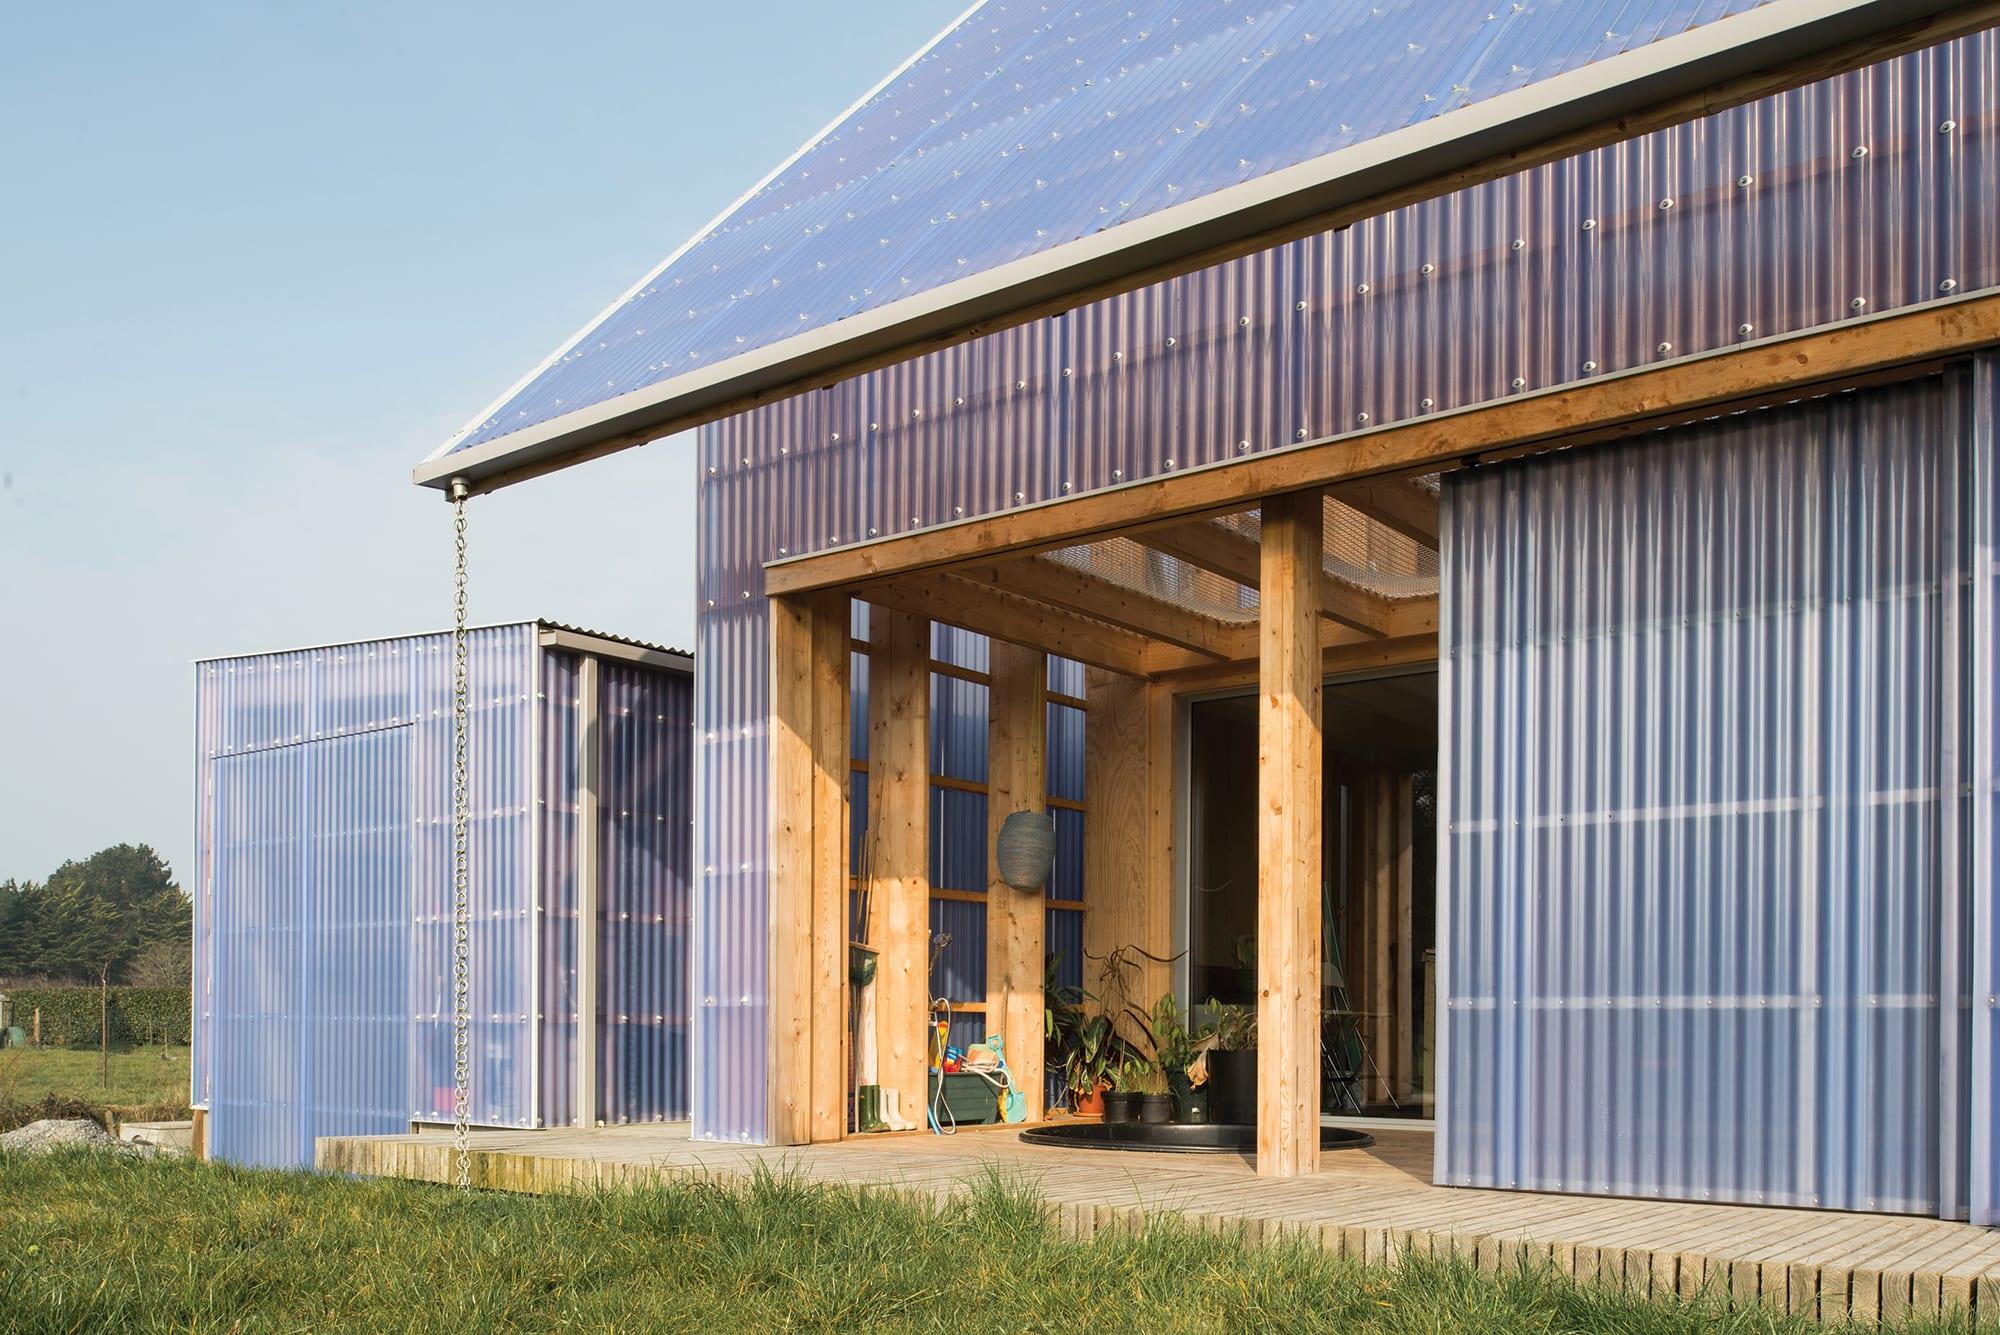 Comment Ventiler Un Garage Humide brut architectes, maxime castric · pendu · divisare